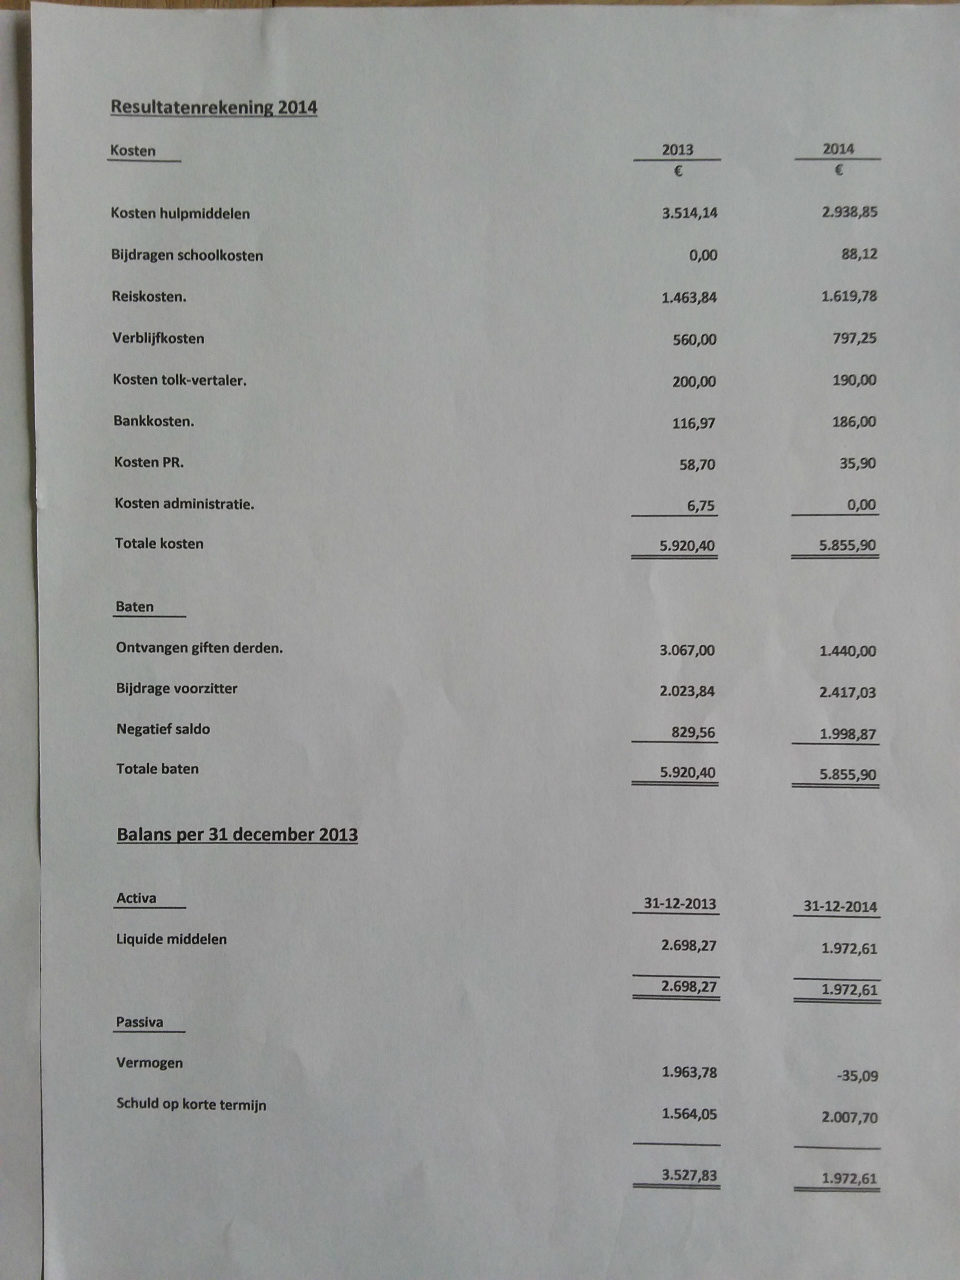 Resultatenrekening 2014